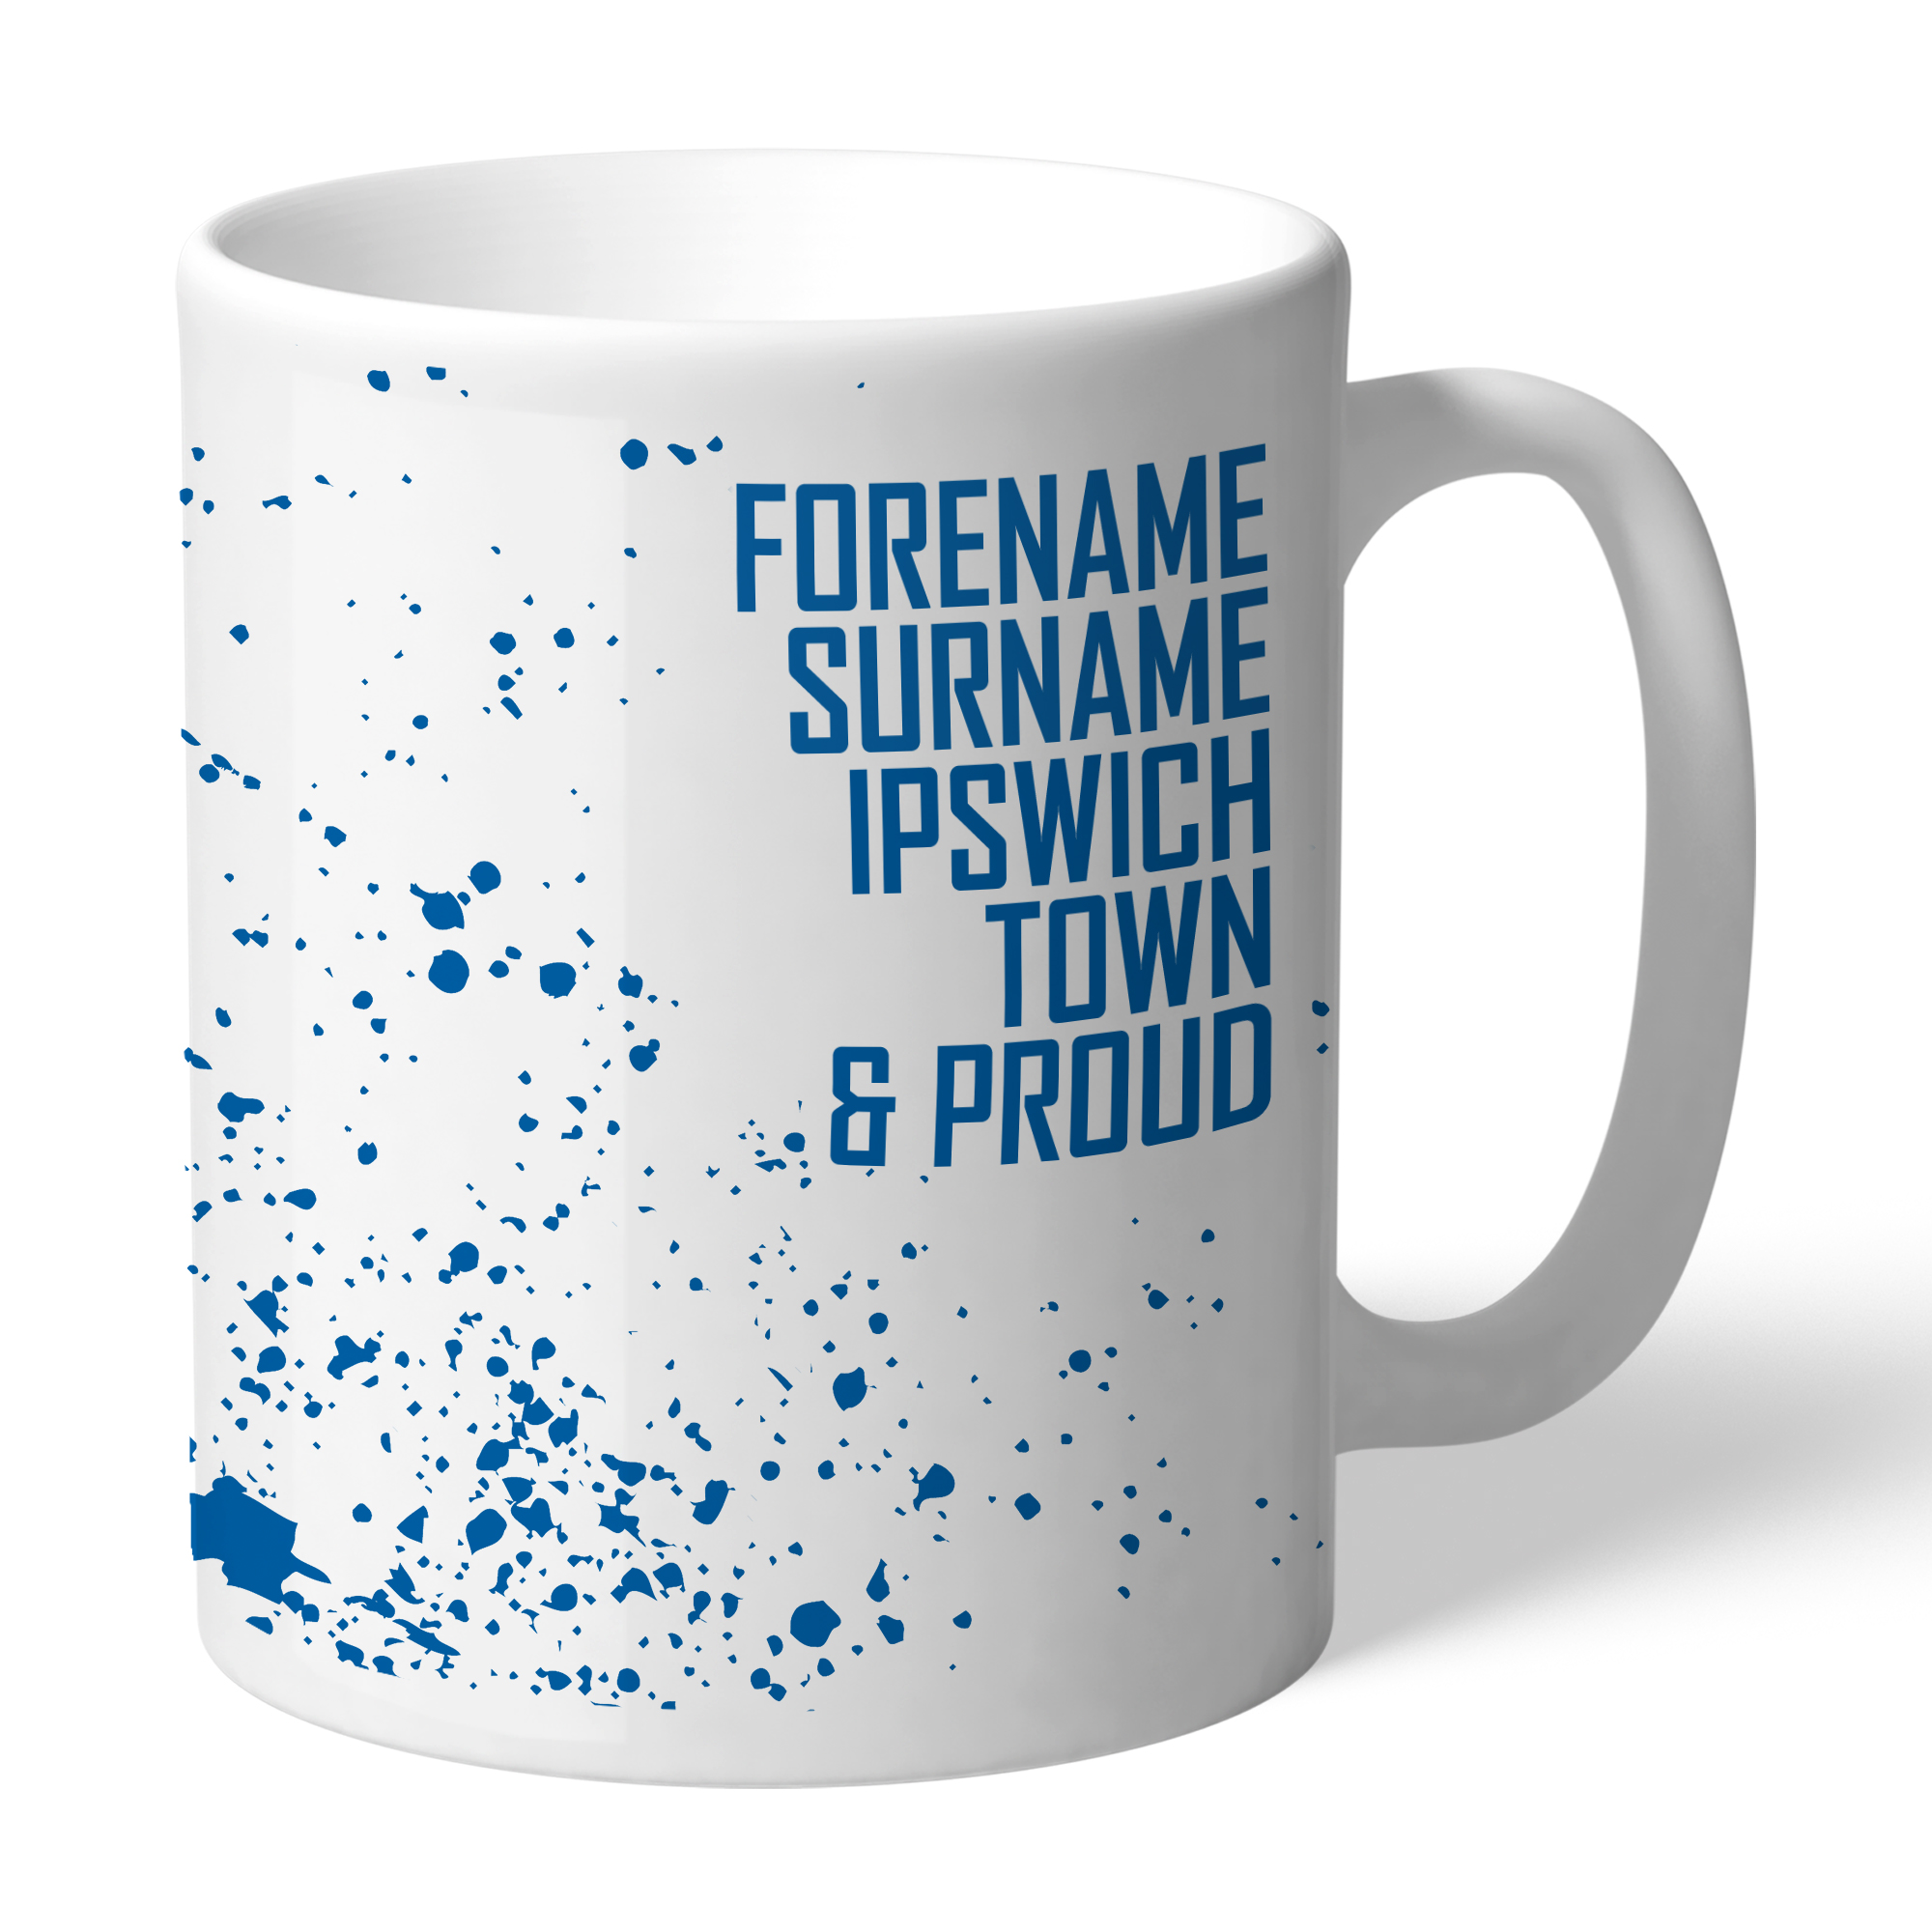 Ipswich Town FC Proud Mug